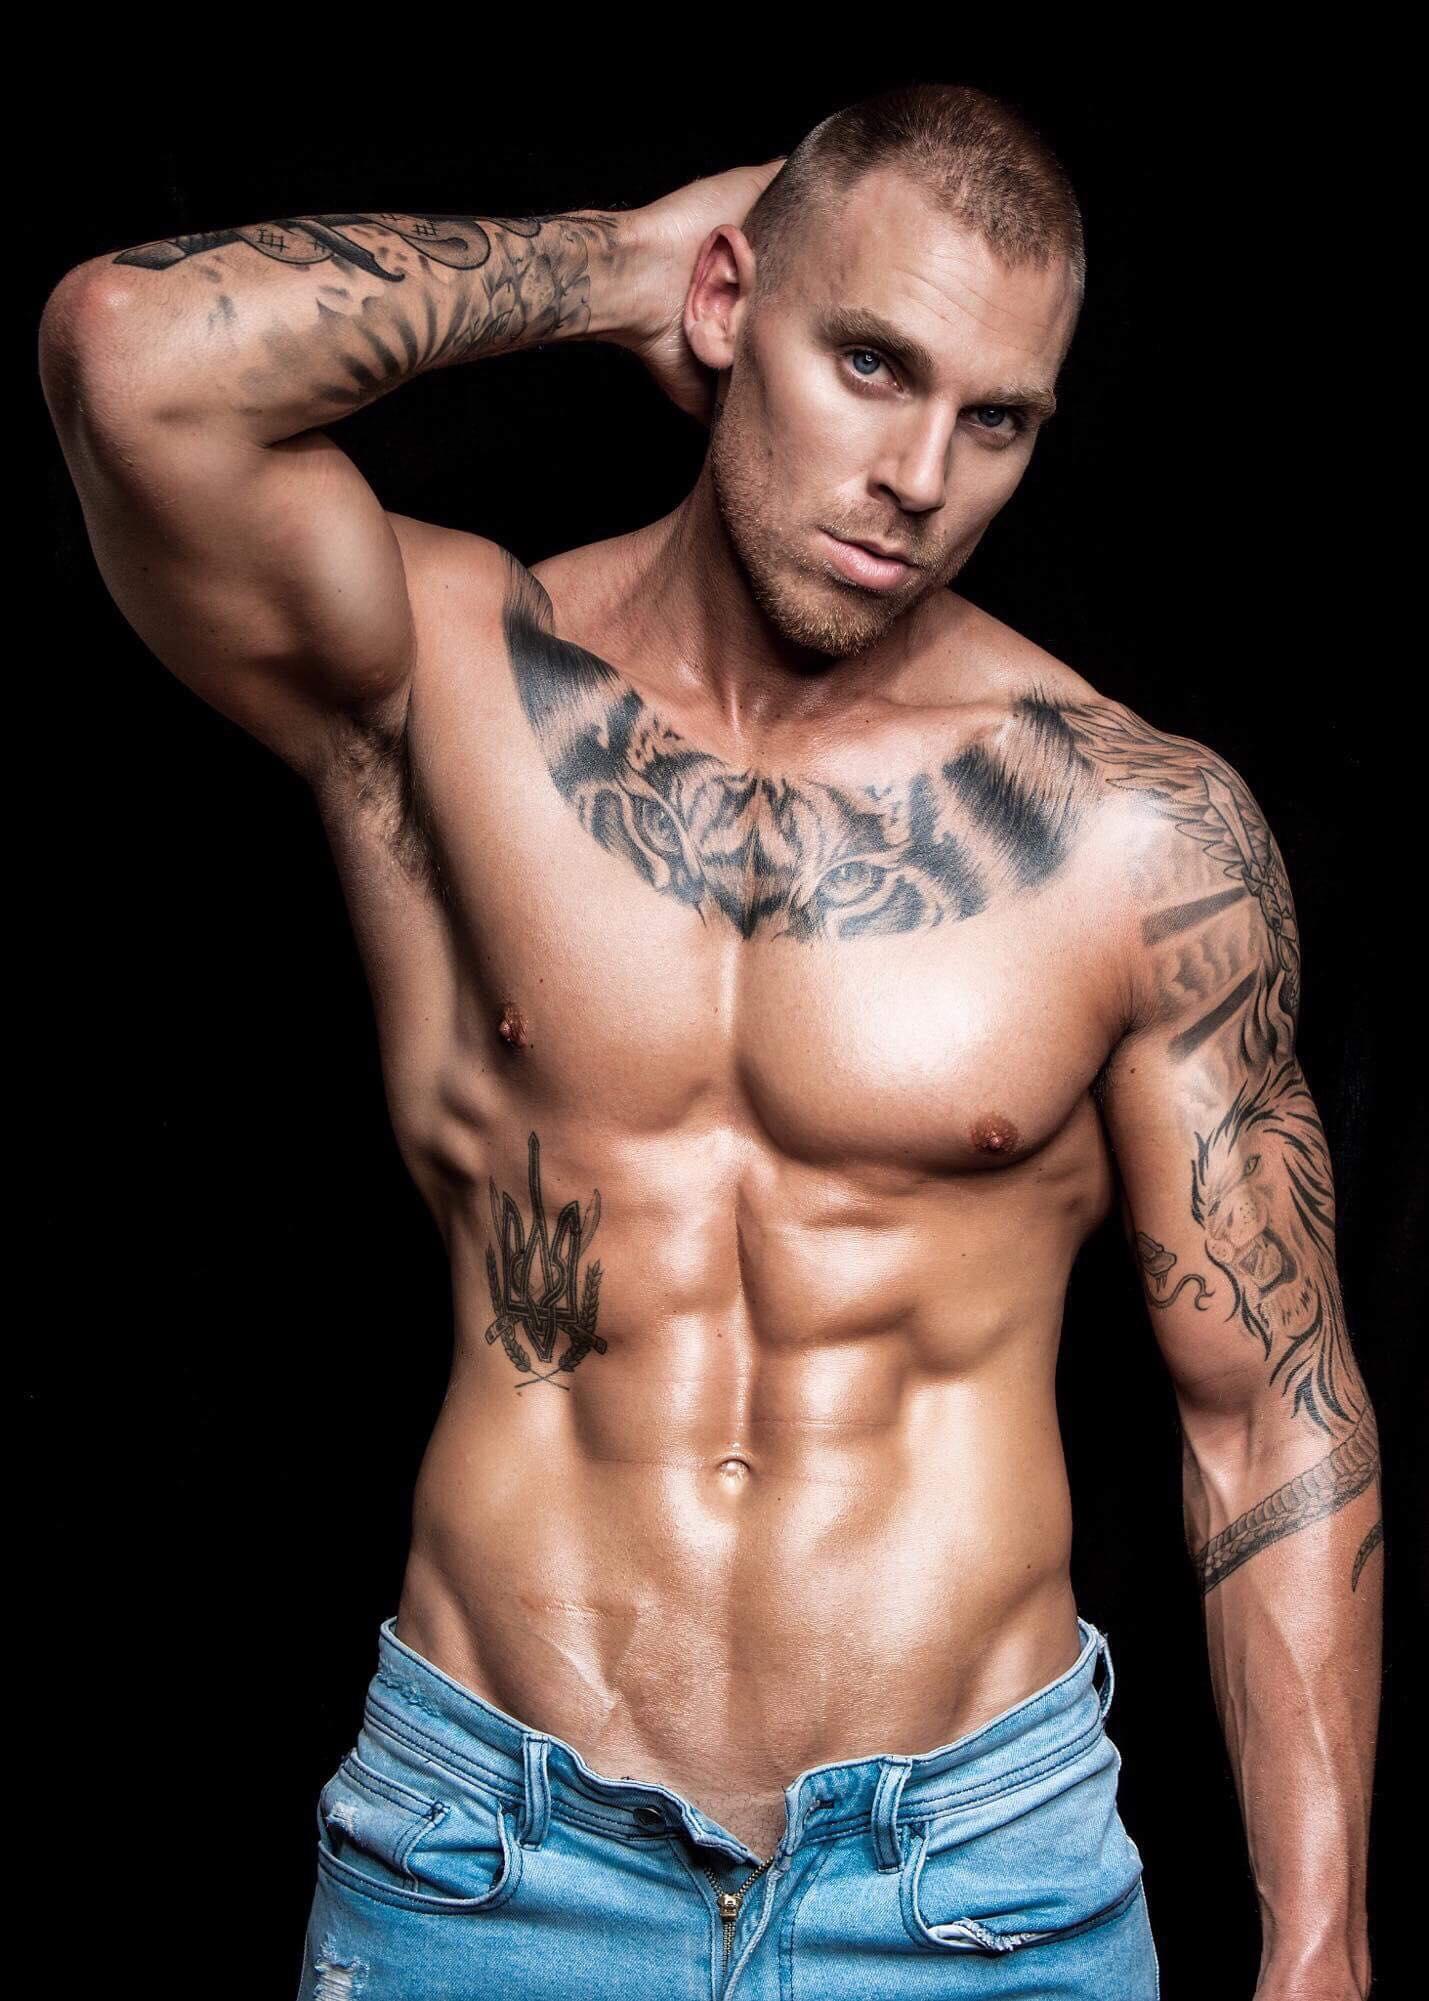 Rudi Sydney male stripper